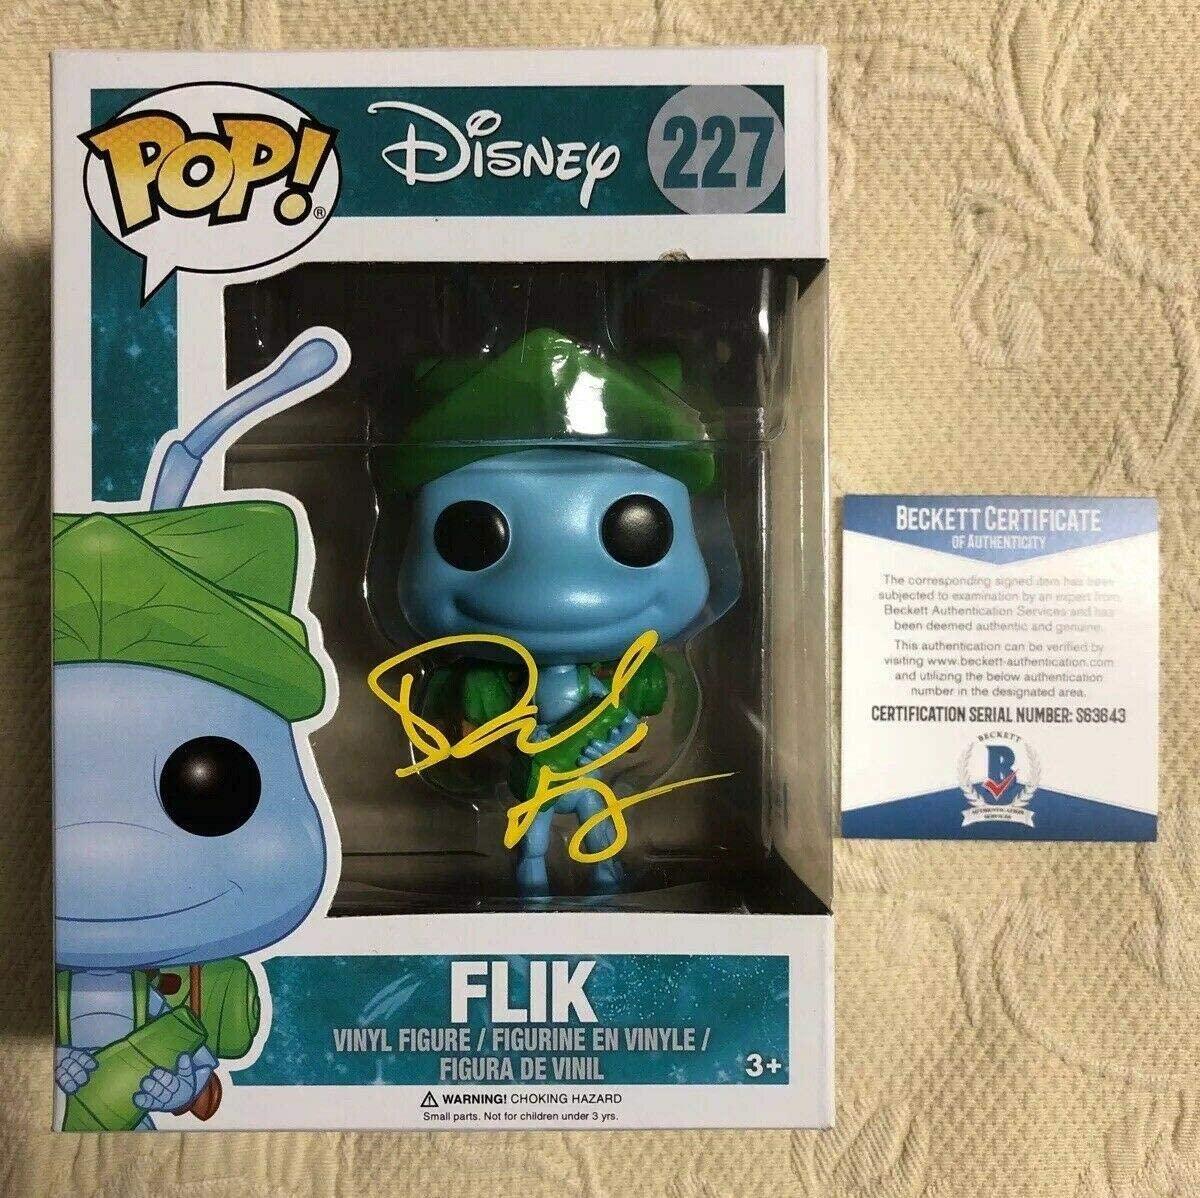 Dave Foley Signed Autographed Flik A Bugs Life Disney Funko POP BECKETT COA 2 - Beckett Authentication